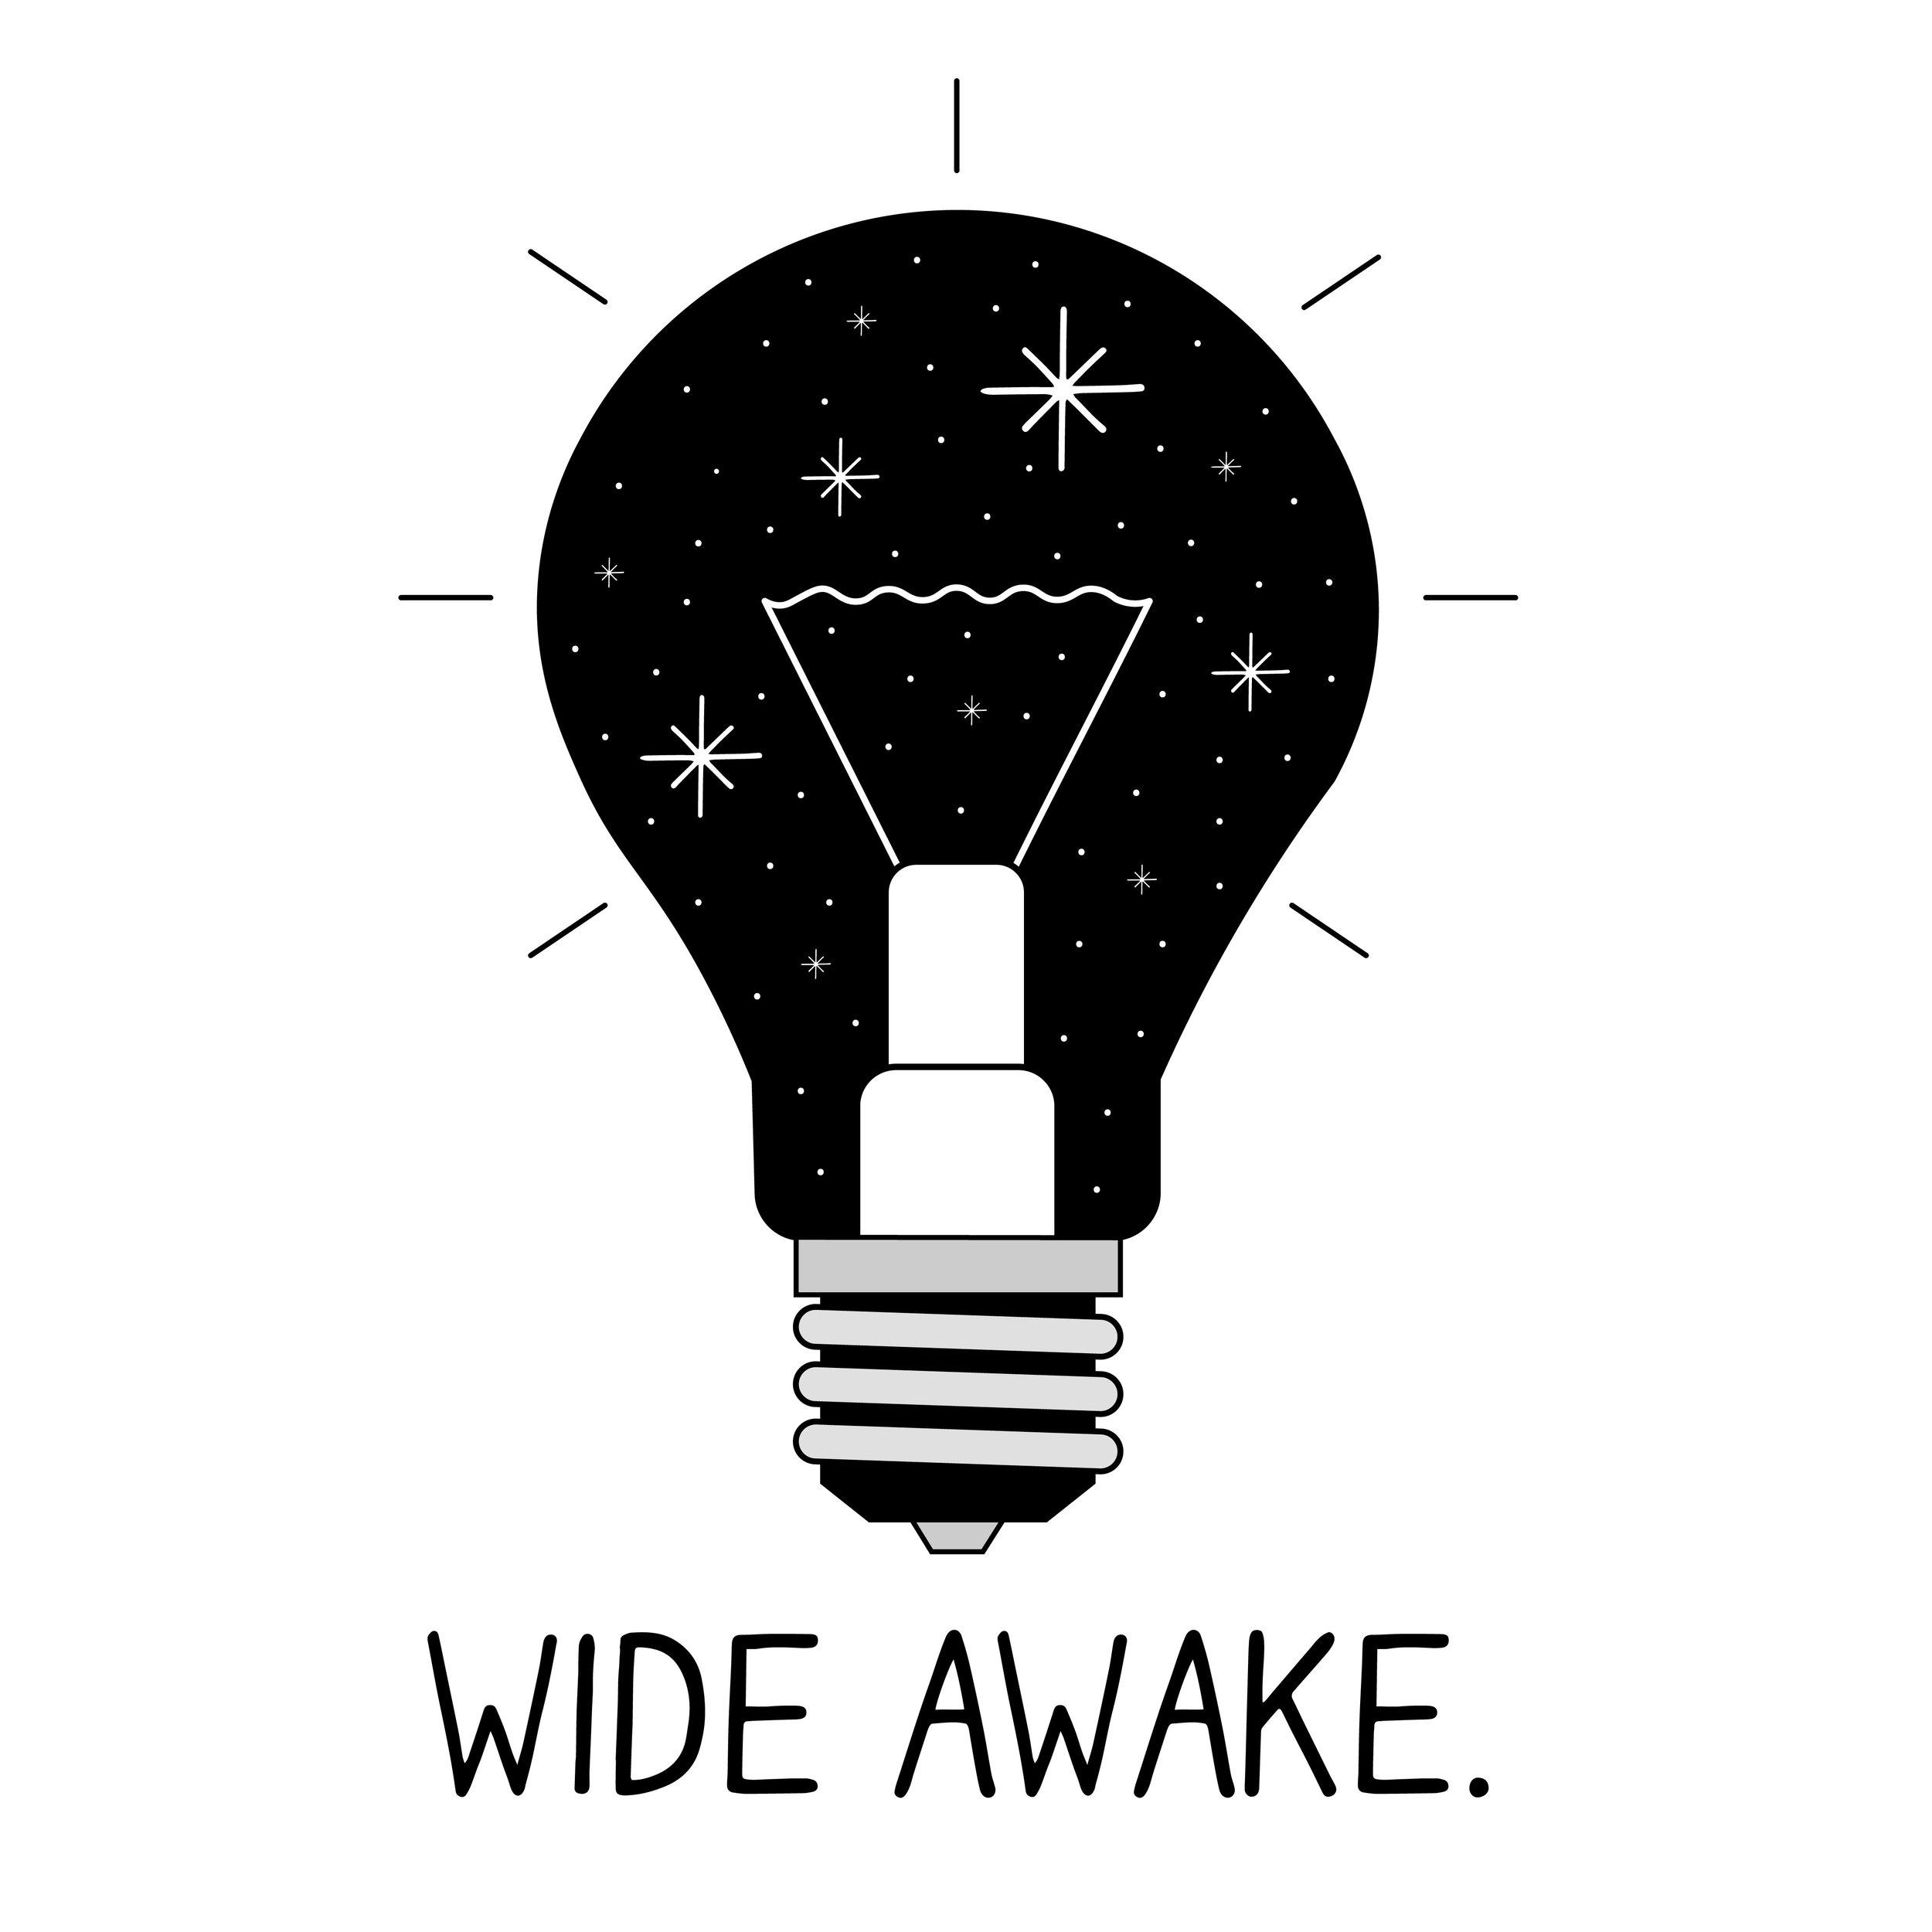 WIDEAWAKE-01.jpg